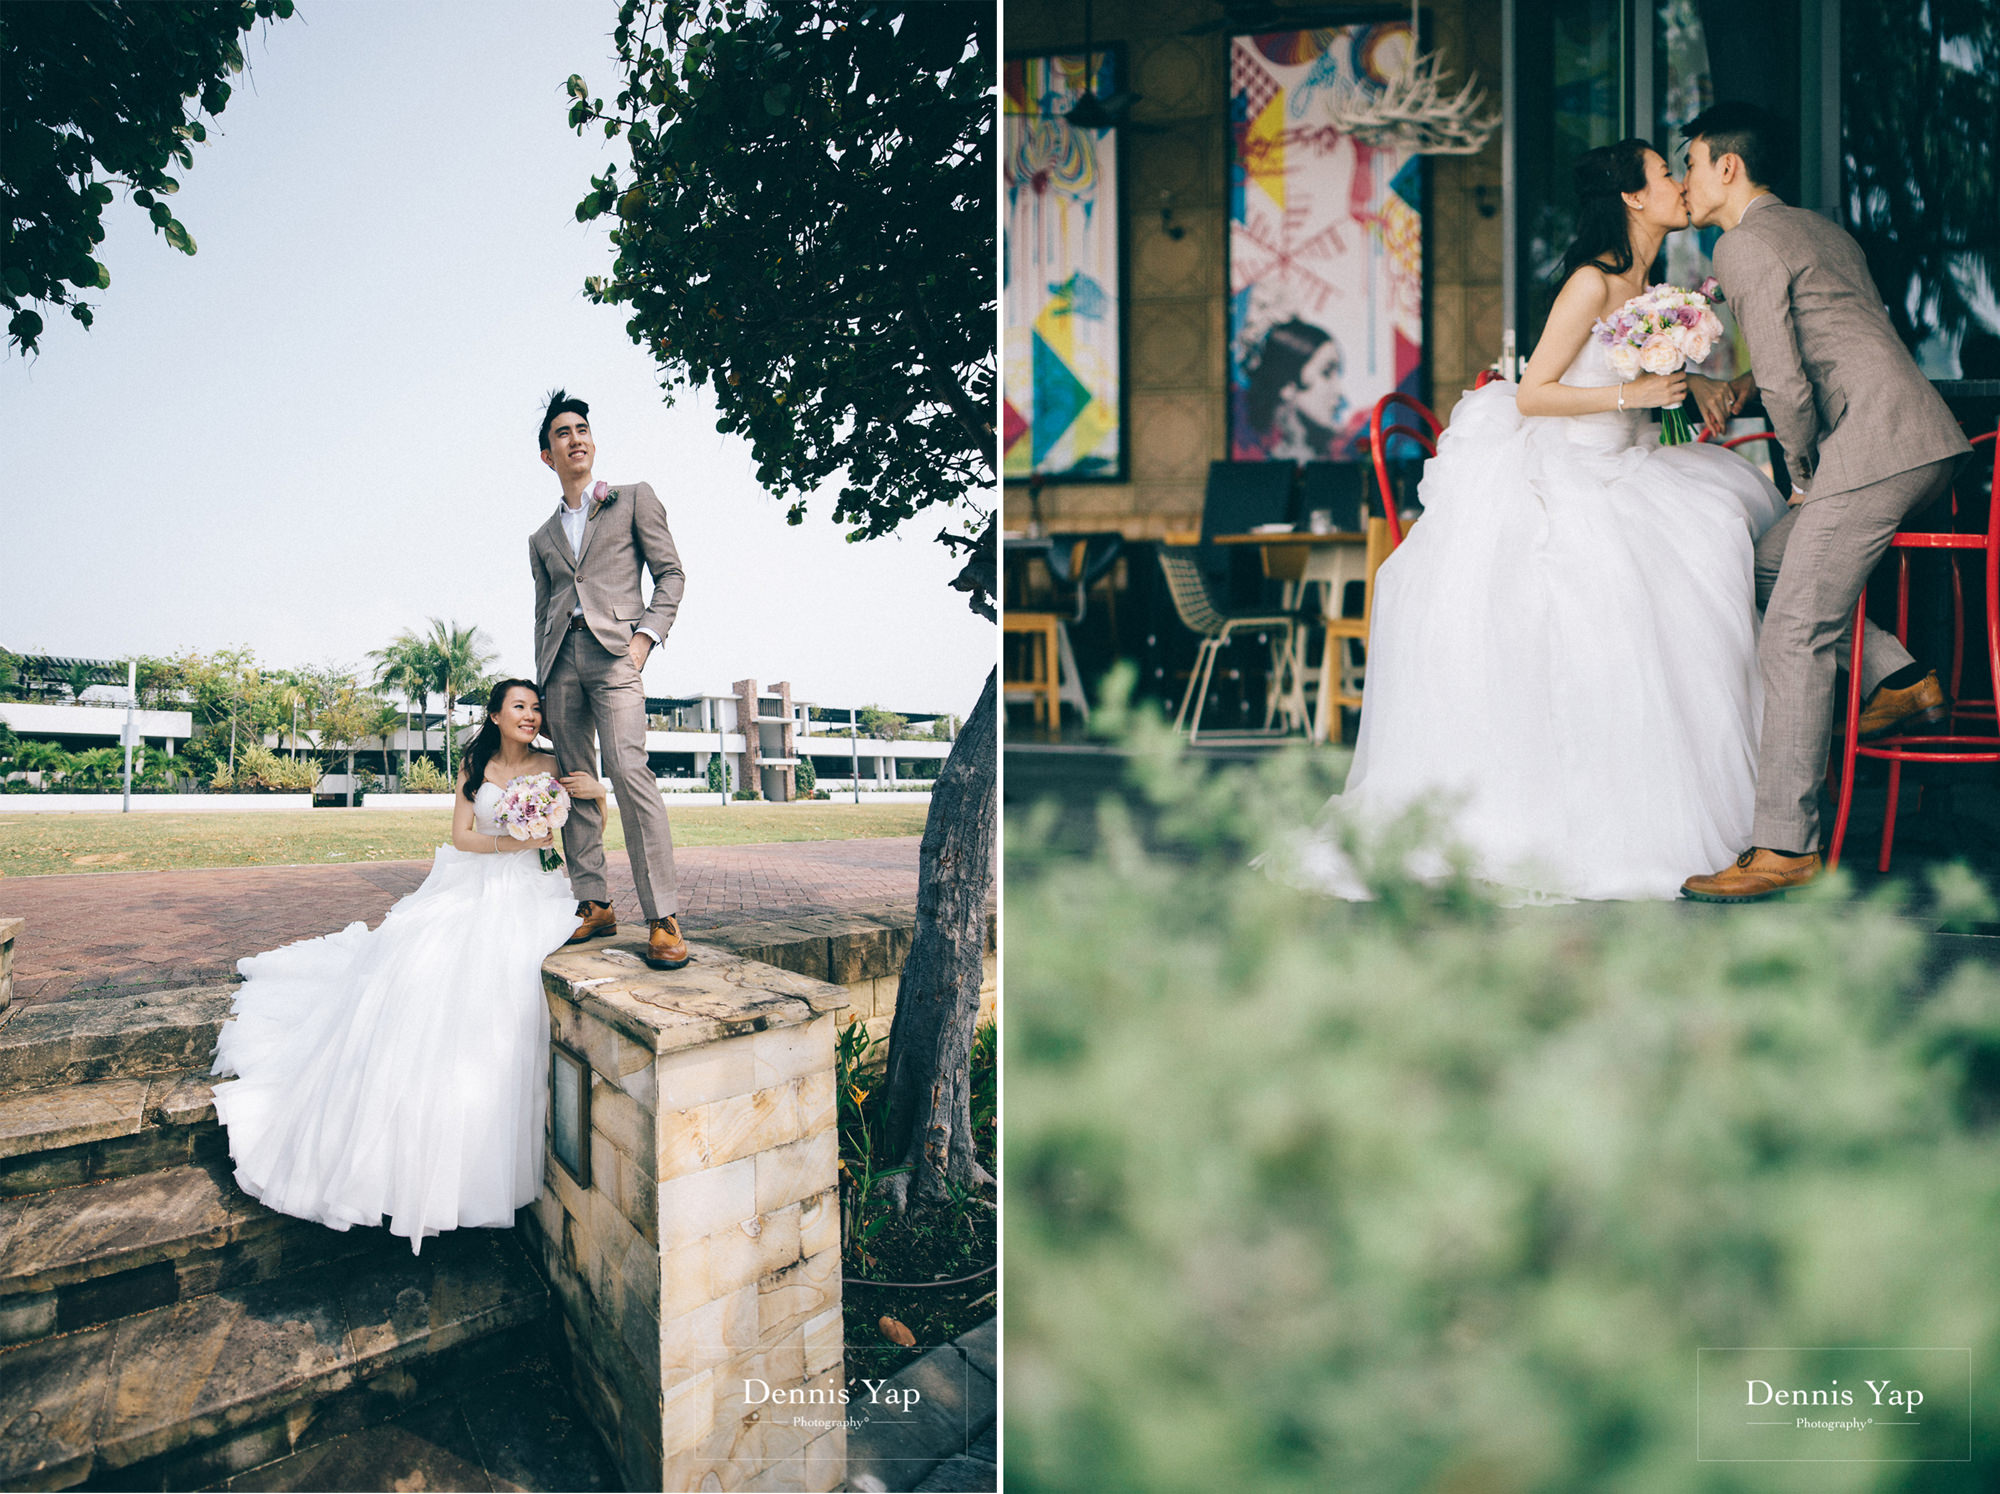 danny sherine wedding reception registration of marriage yacht fun beloved sea dennis yap photography malaysia top wedding photographer-7.jpg